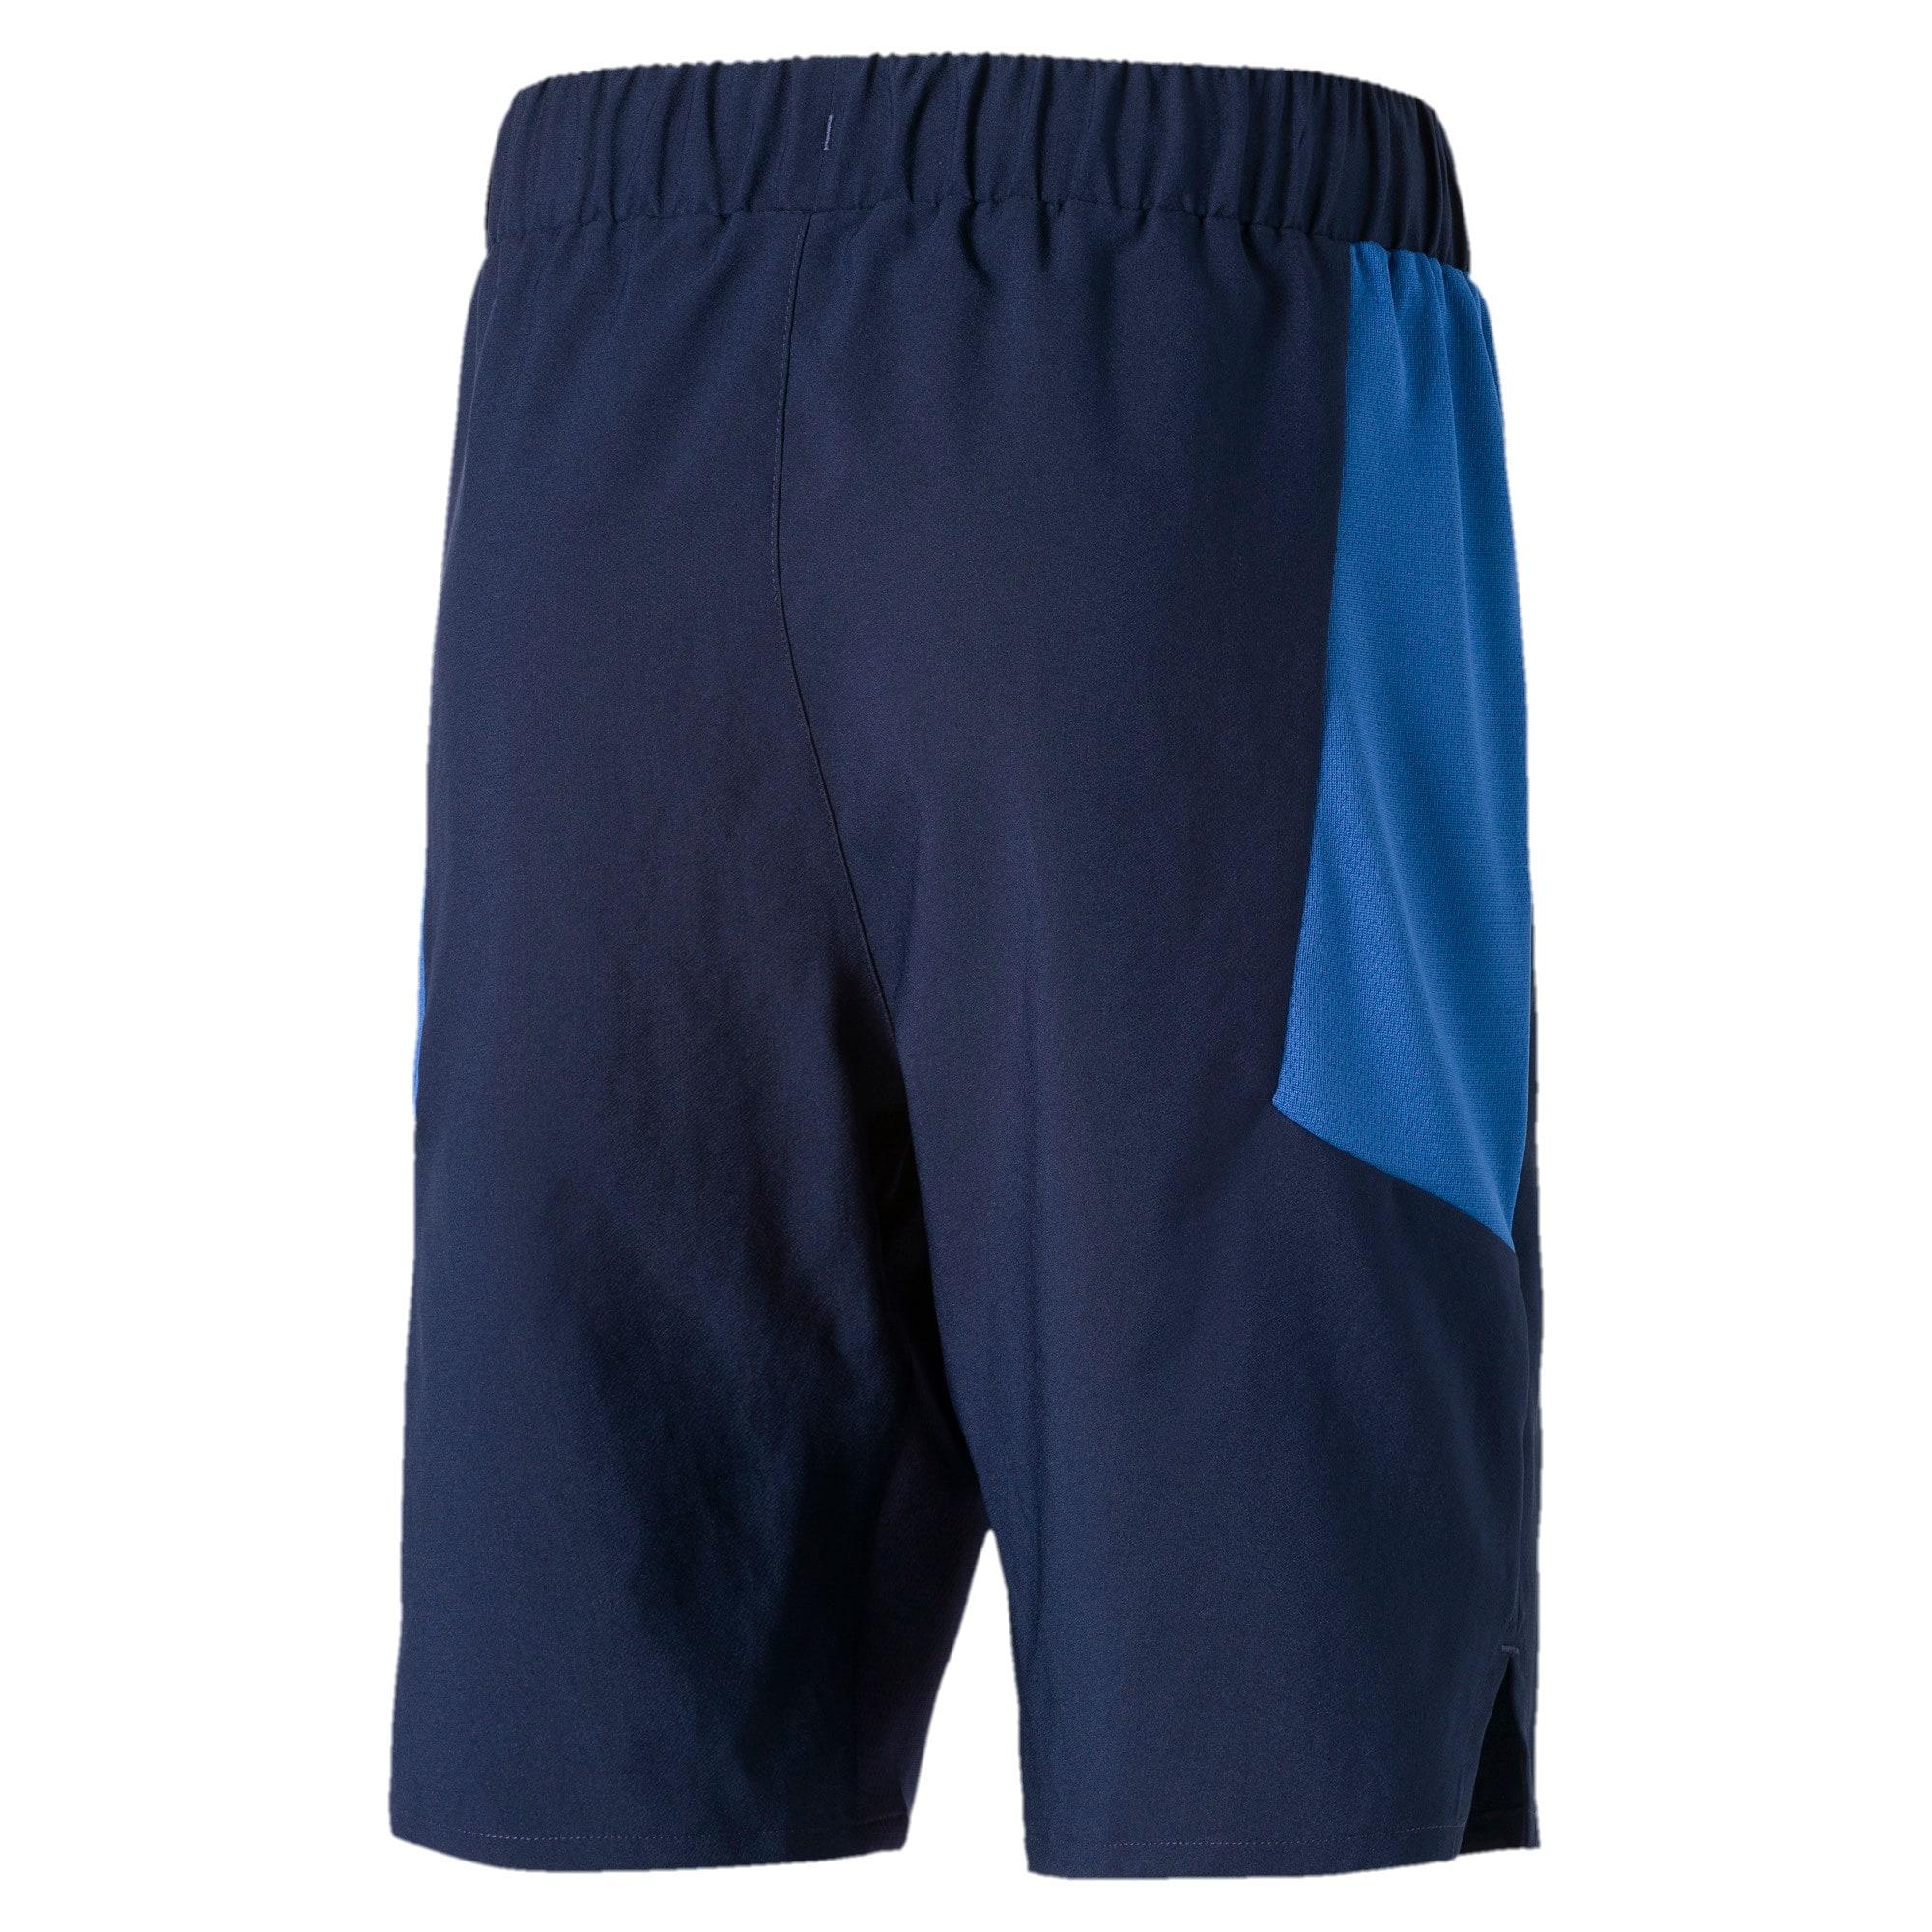 Thumbnail 2 of Active Woven Boys' Shorts, Peacoat, medium-IND